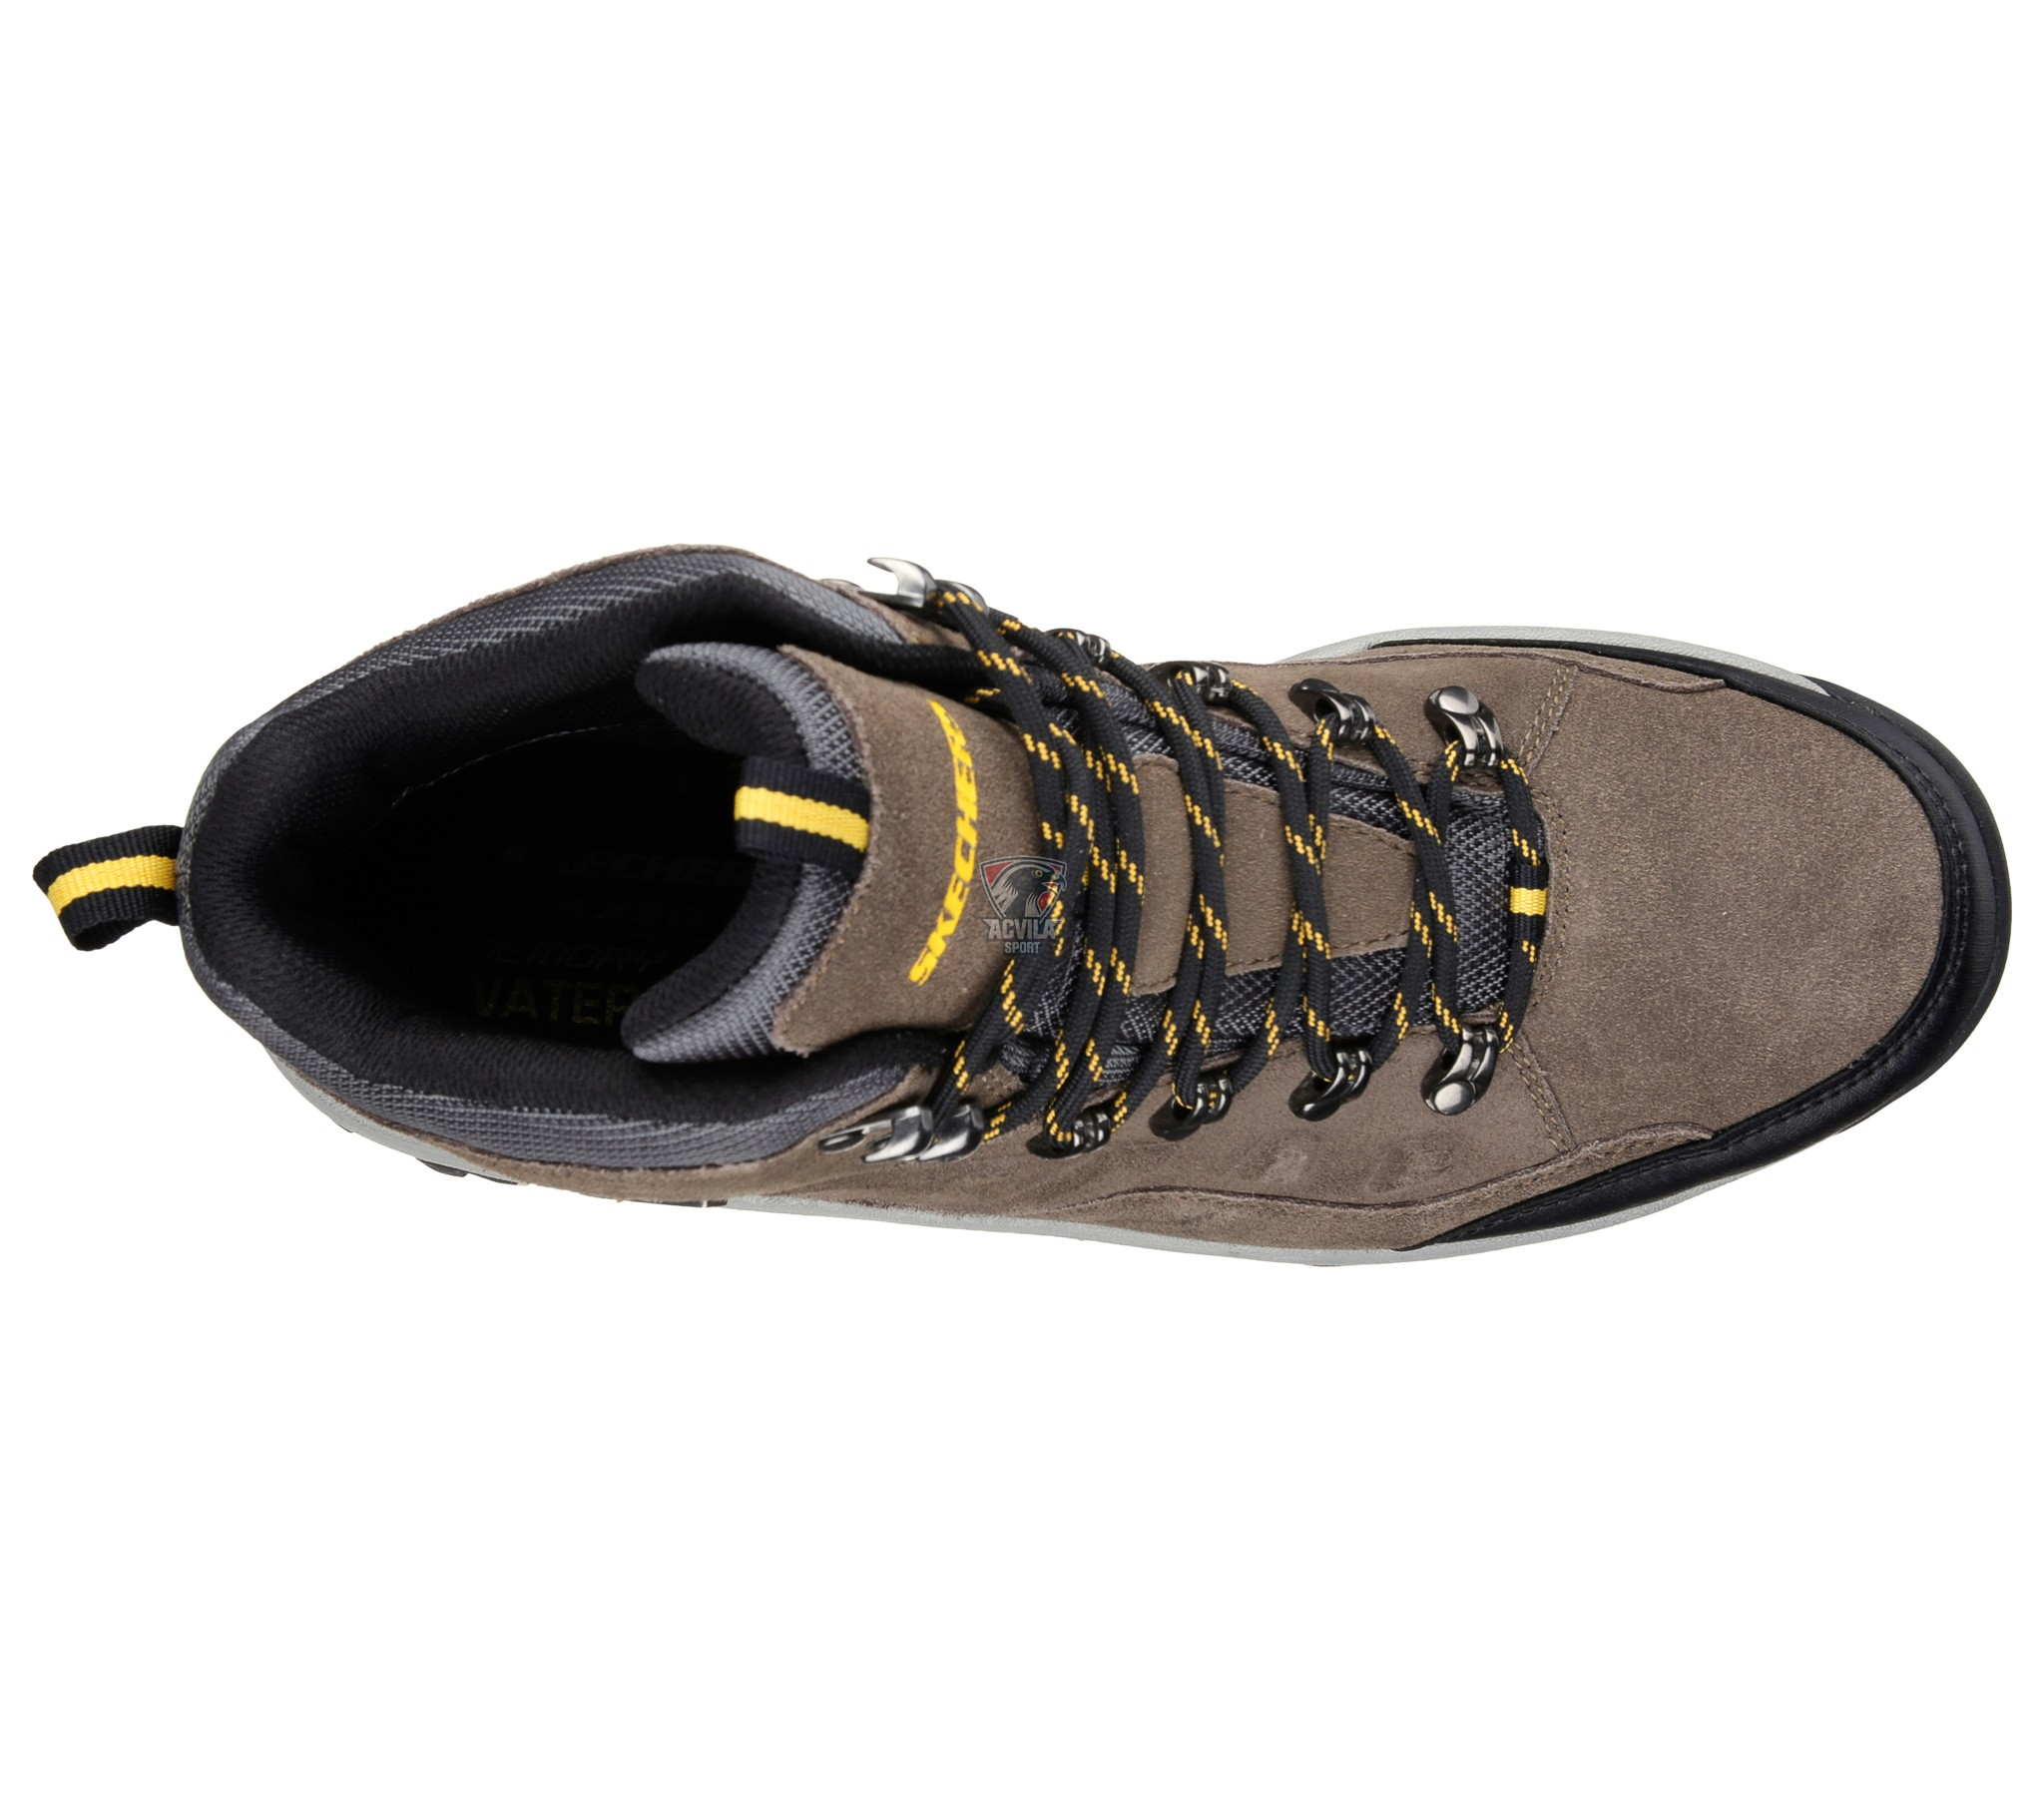 photo 5 Мужская обувь SKECHERS RELMENT- PELMO